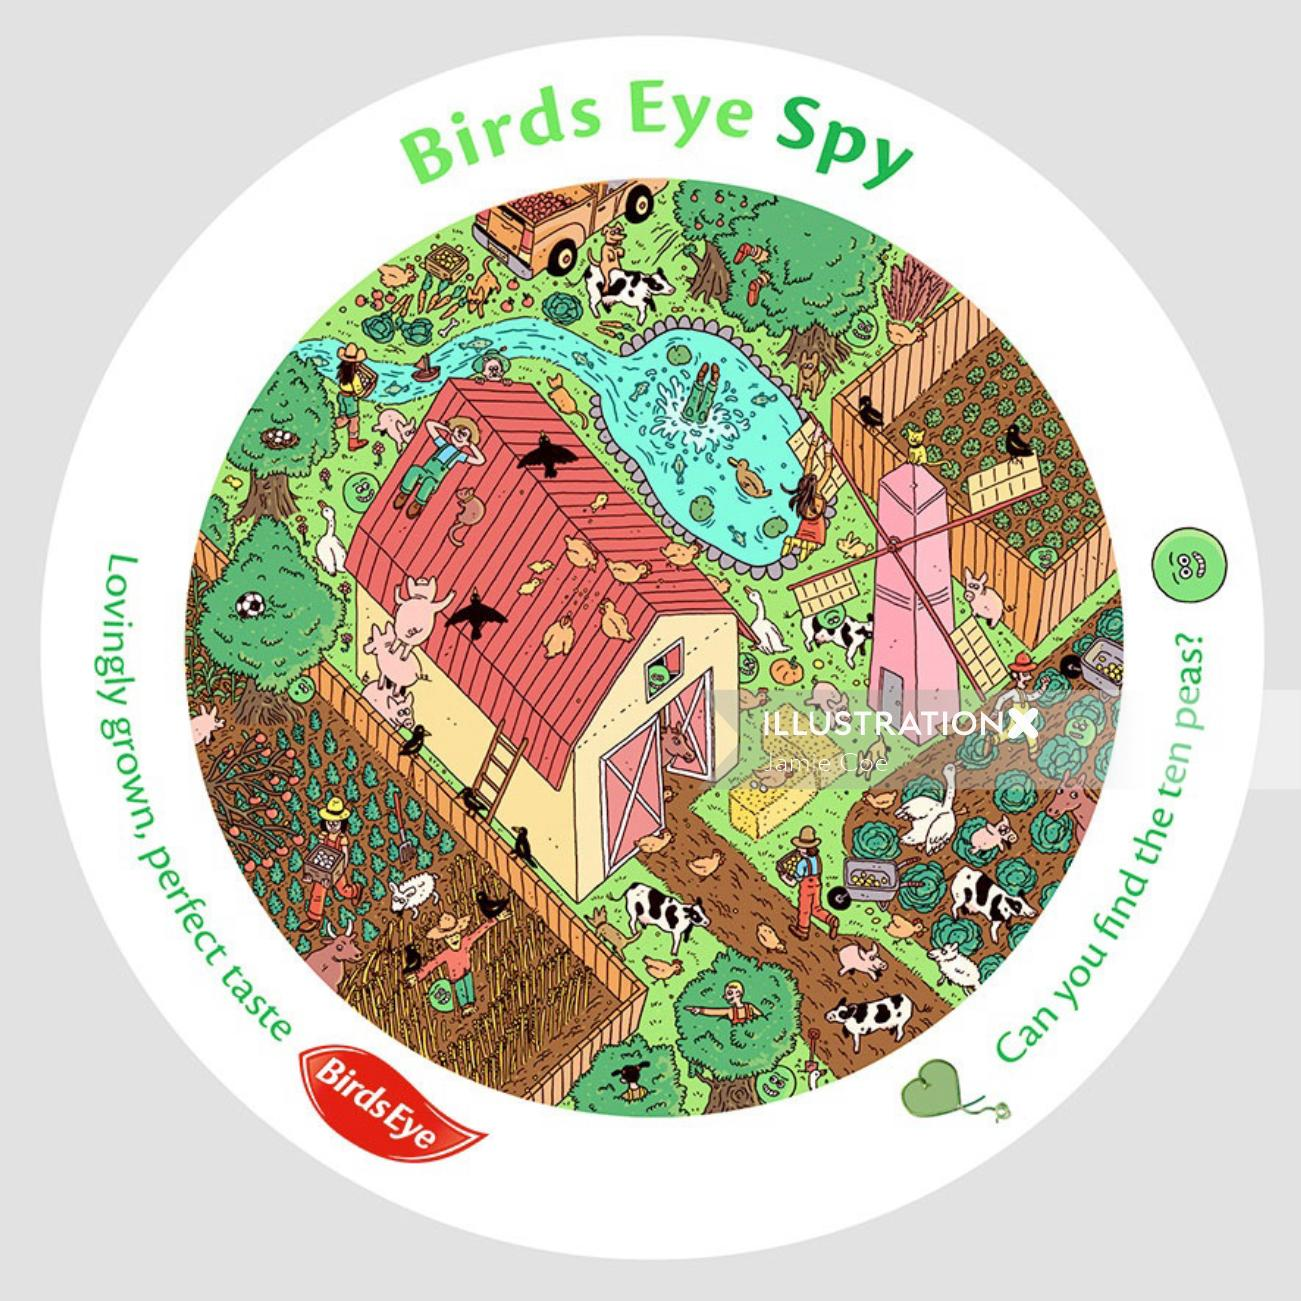 Graphic design of birds eye spy